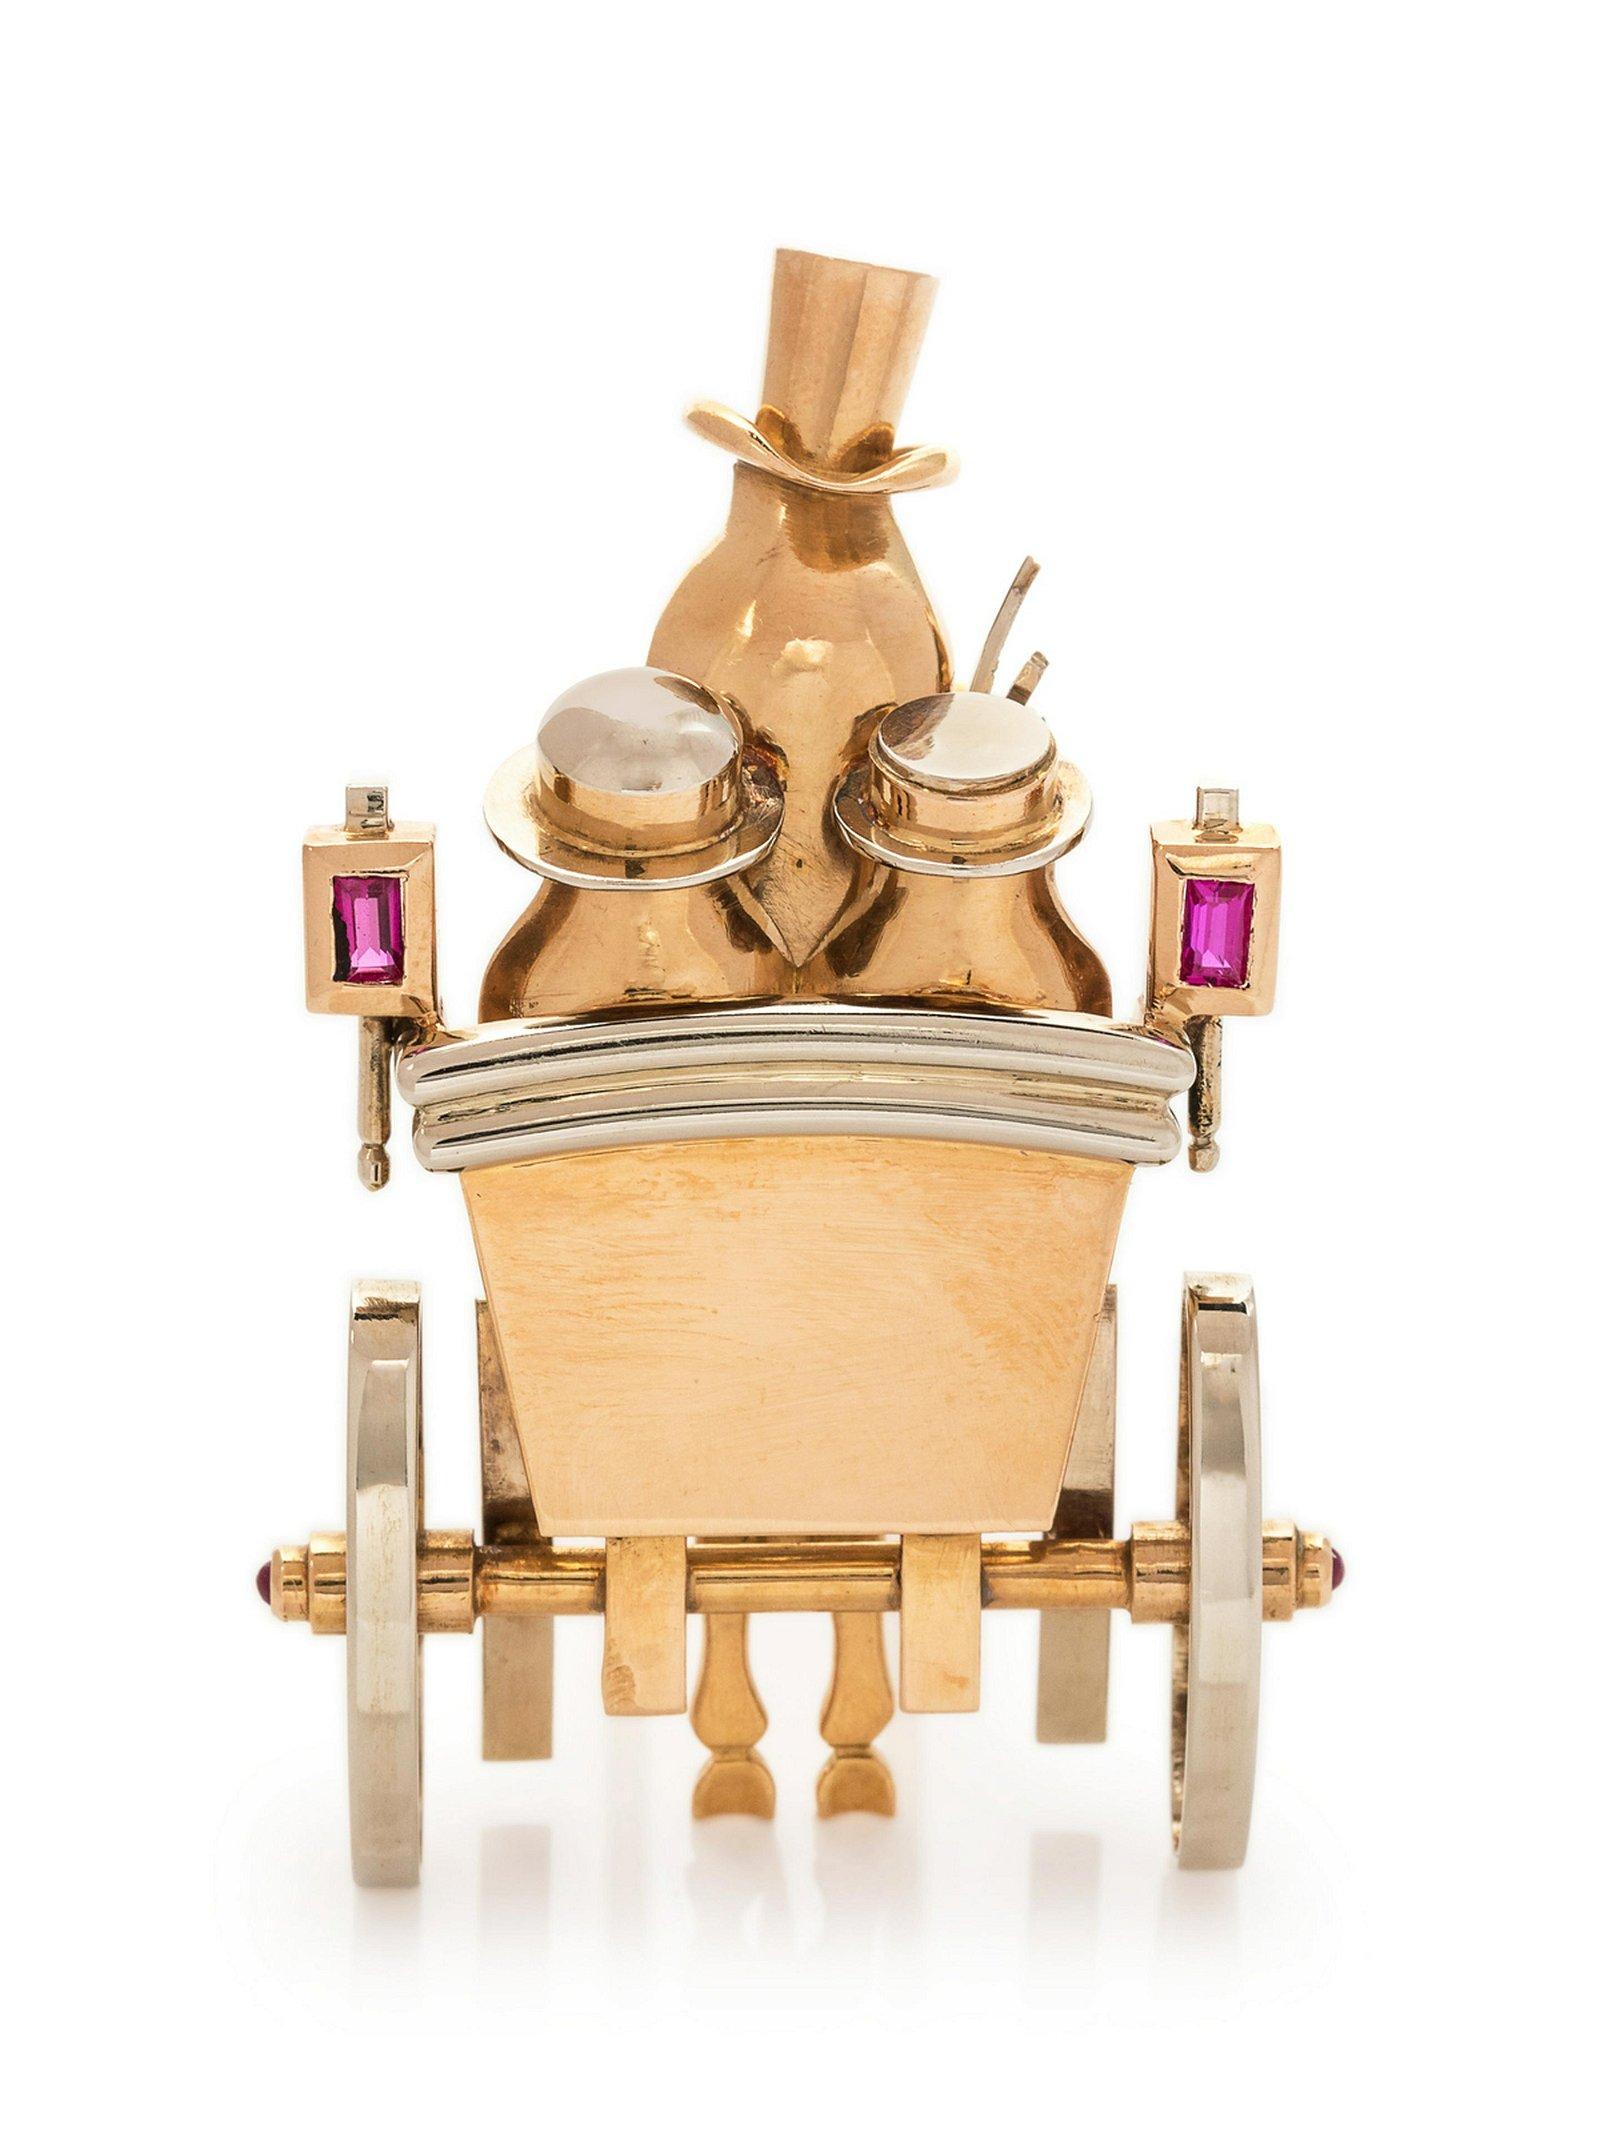 A Retro Bicolor 18 Karat Gold and Ruby Carriage Motif